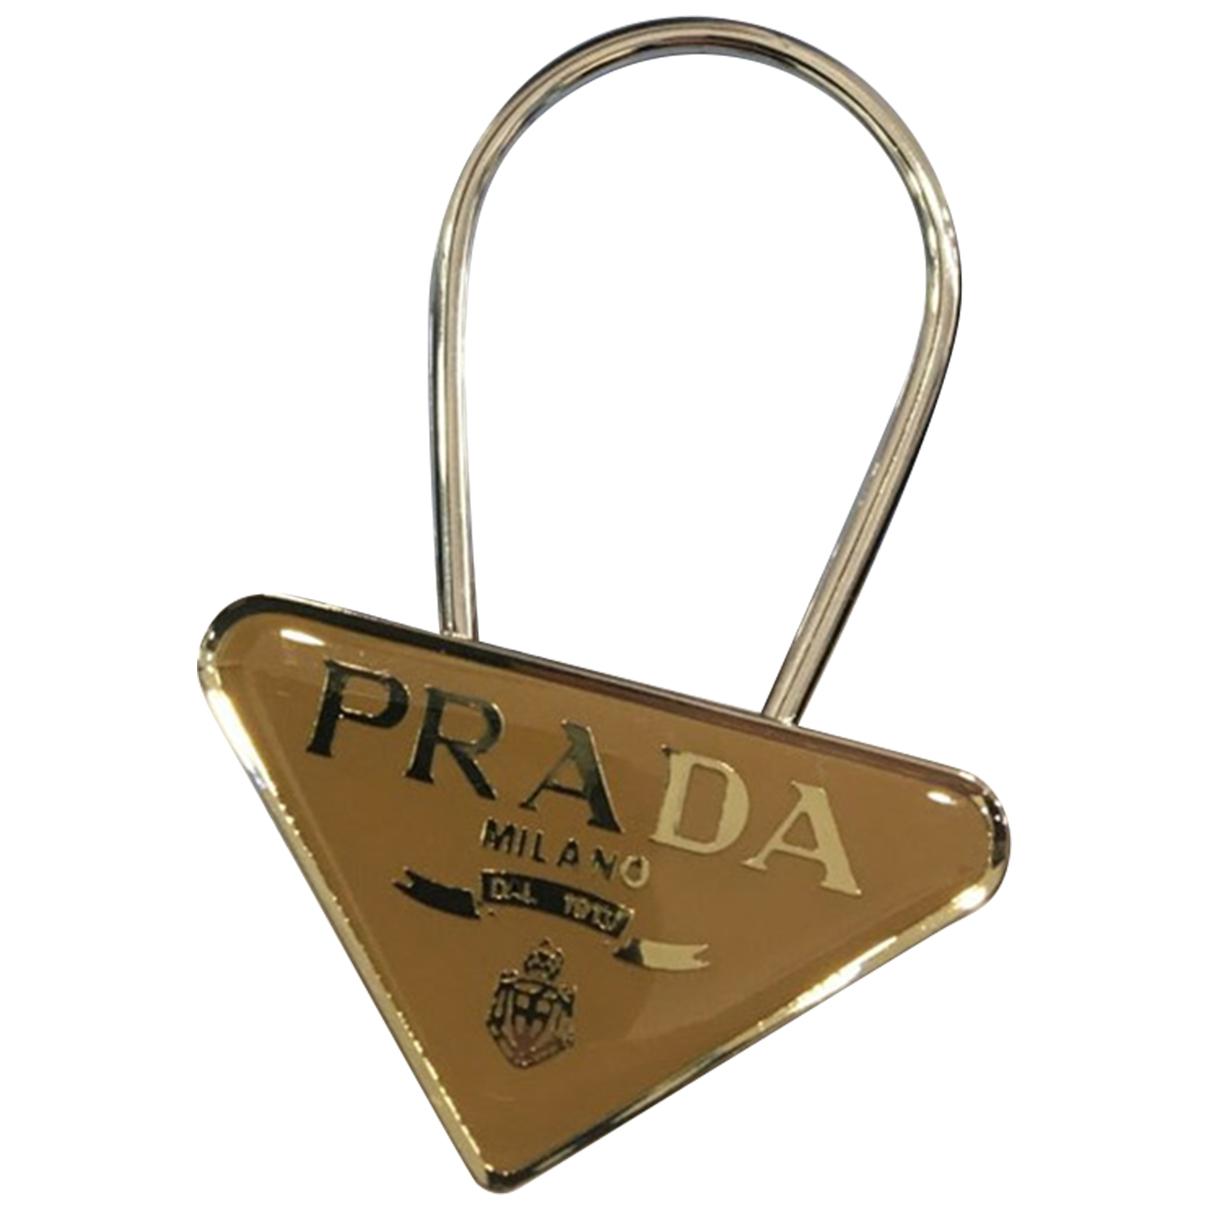 Prada \N Taschenschmuck in  Beige Metall